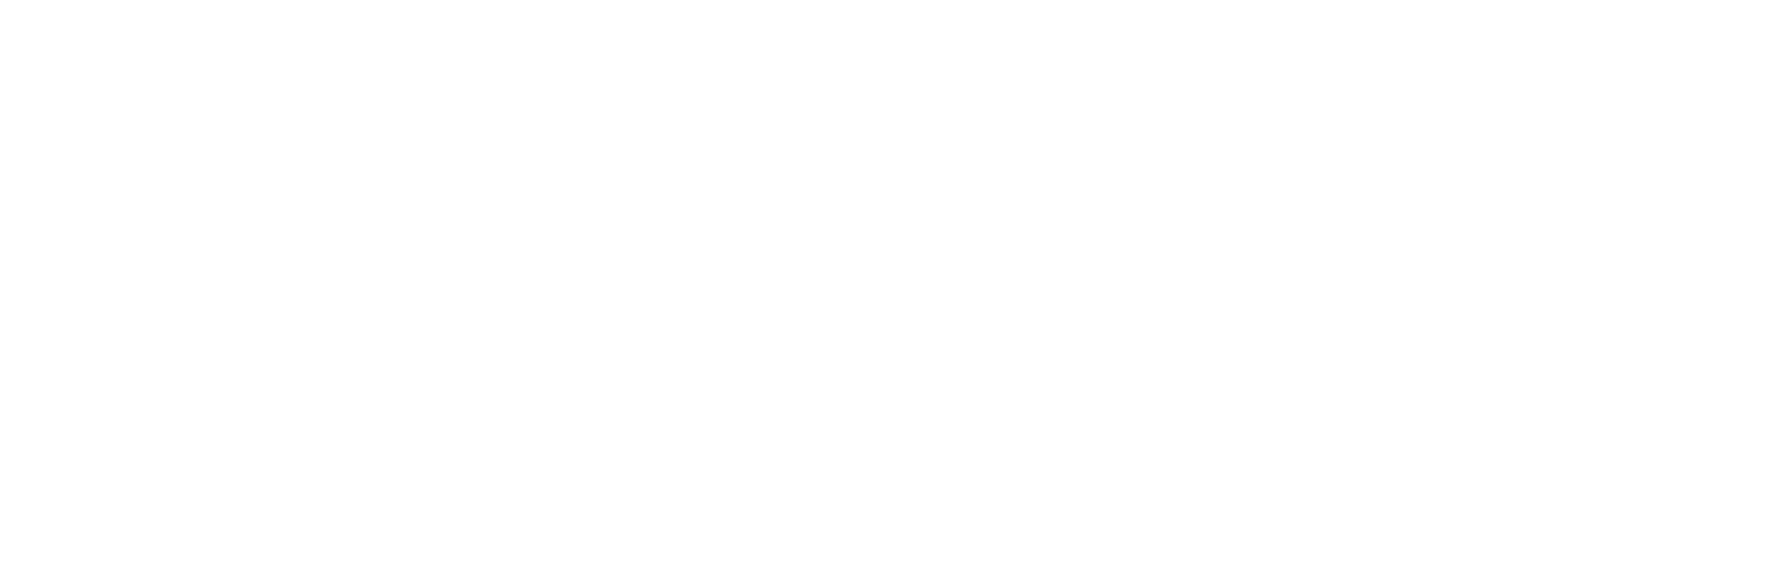 Taylor Family Vineyards | Napa Valley, California Logo